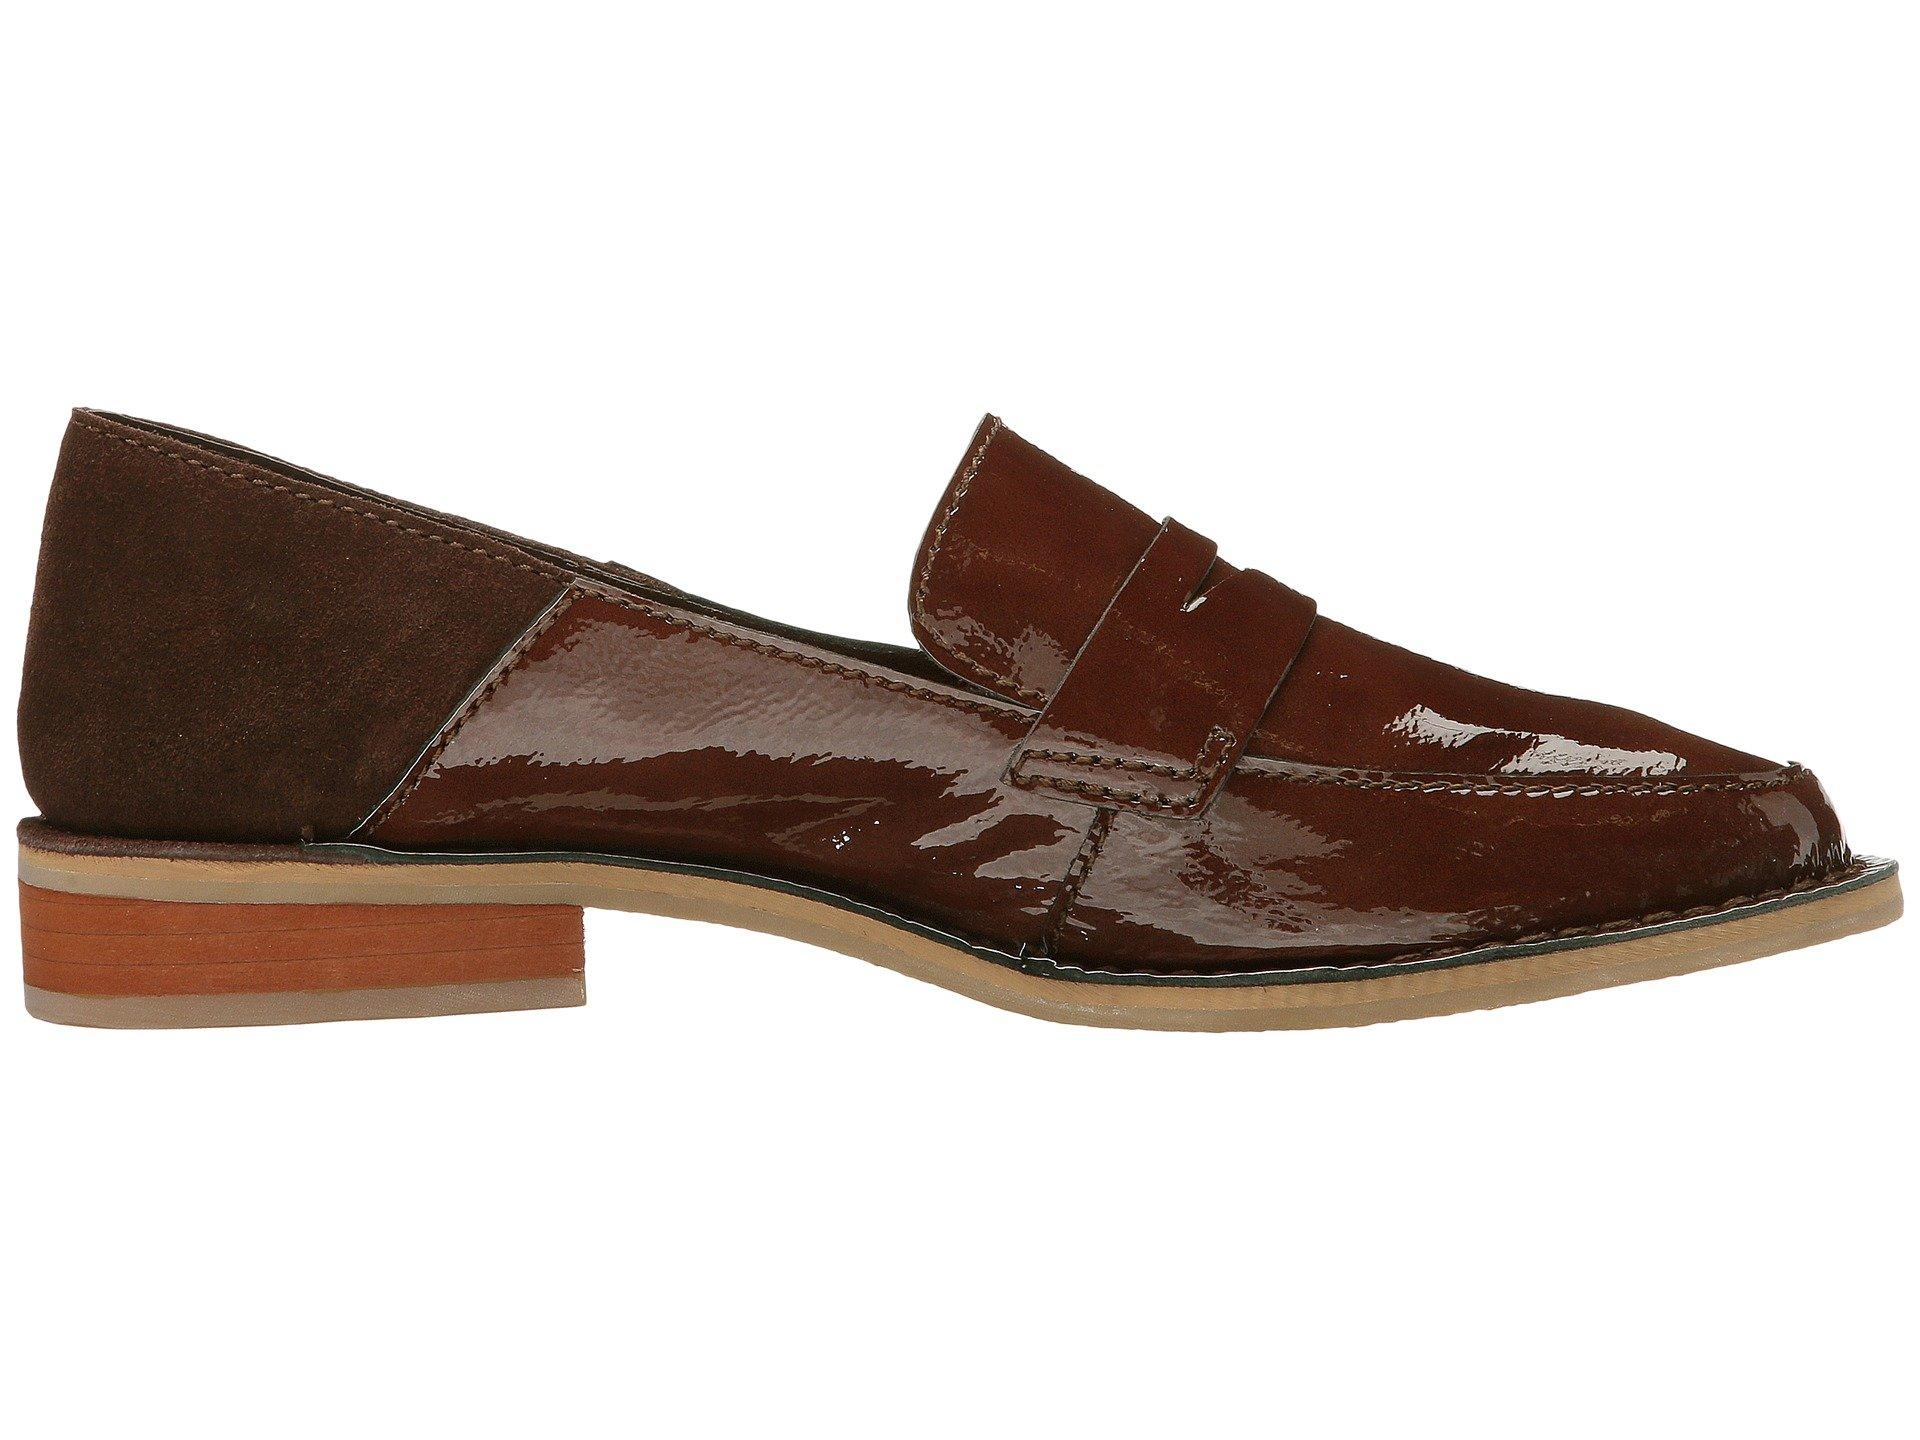 Kelsi Dagger Shoes Size Chart